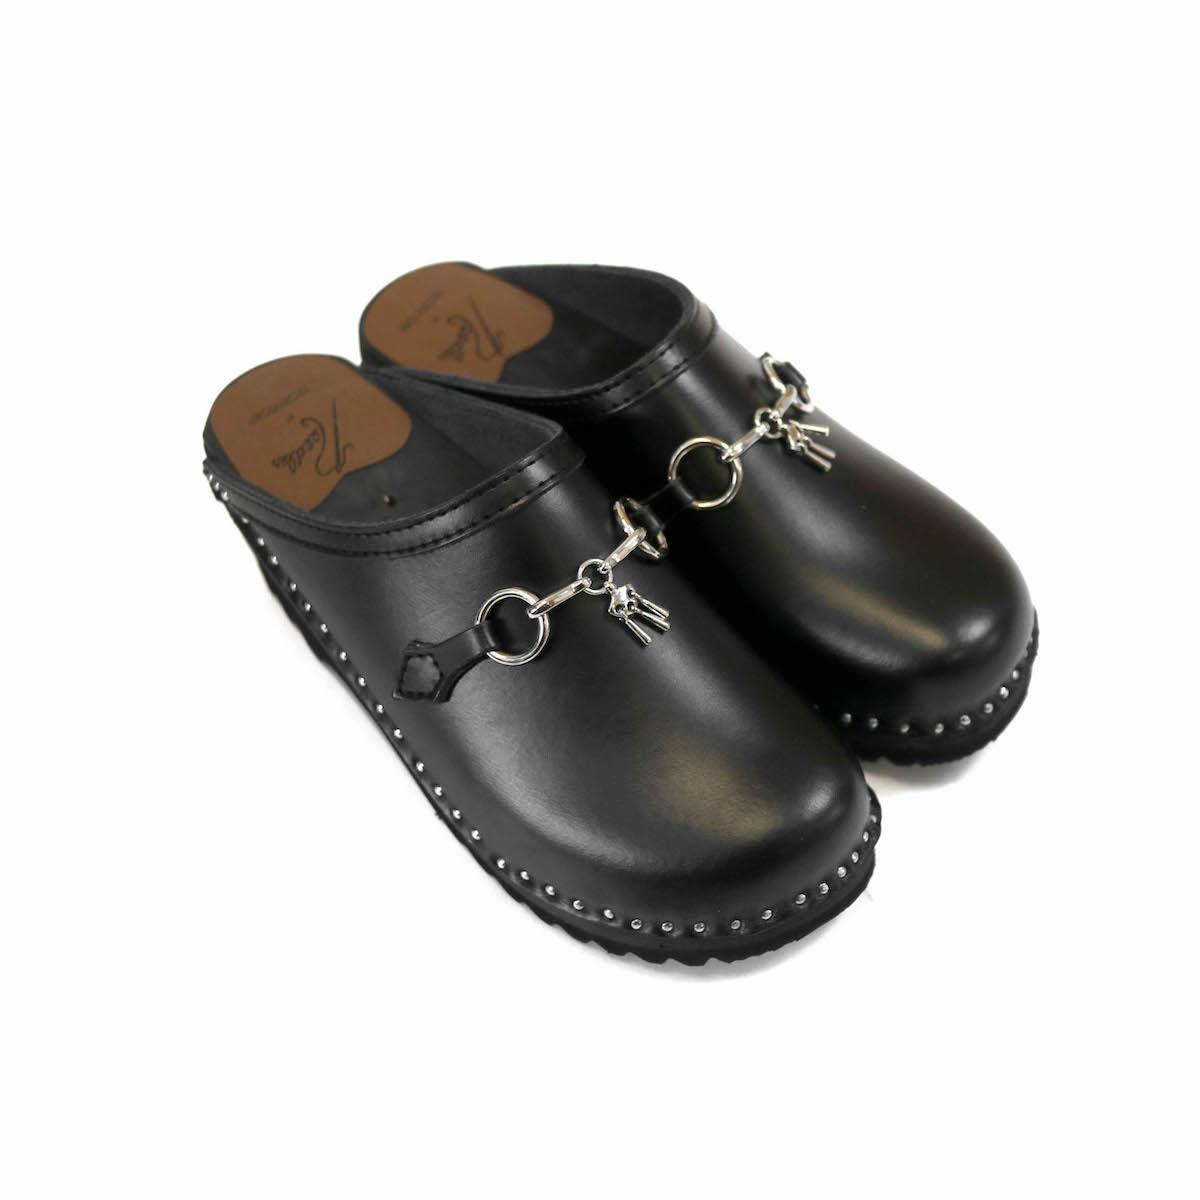 Needles × Troentorp / Swedish Clog -Plain Toe / Bit (Black)